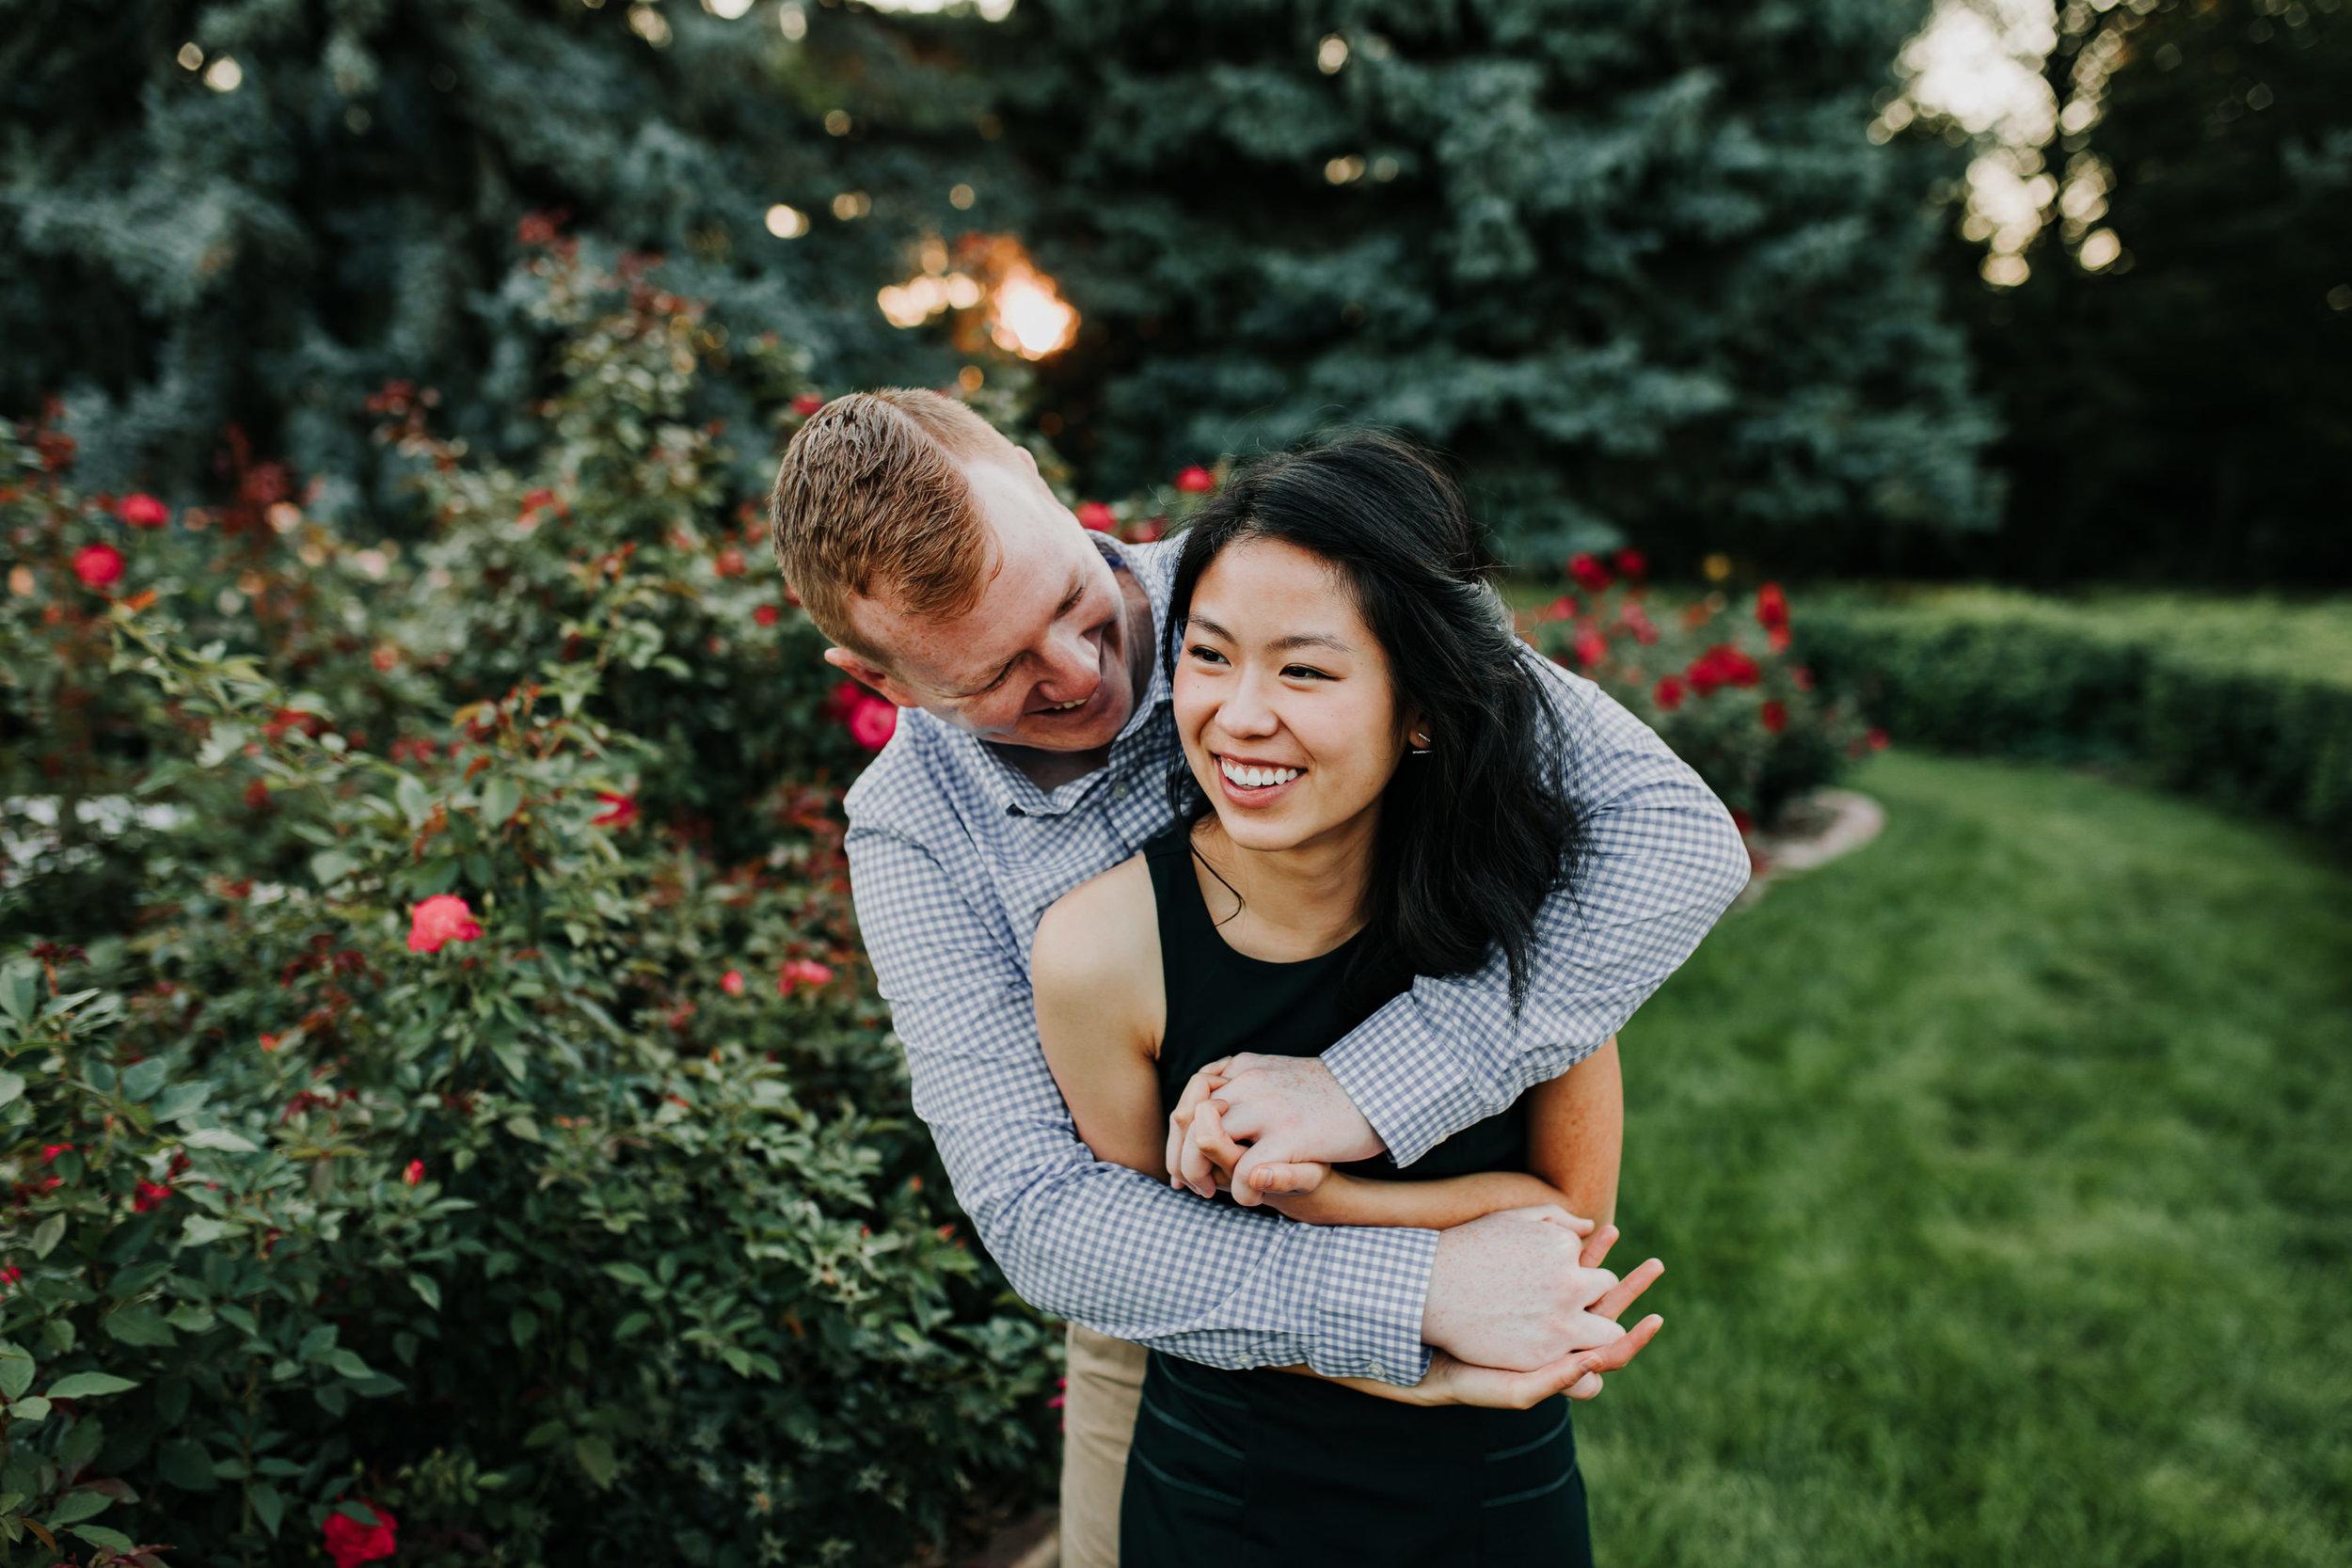 Catherin & Kyle - Married - Nathaniel Jensen Photography - Omaha Nebraska Wedding Photograper - Memorial Park - Joslyn Castle Engagement Session-62.jpg